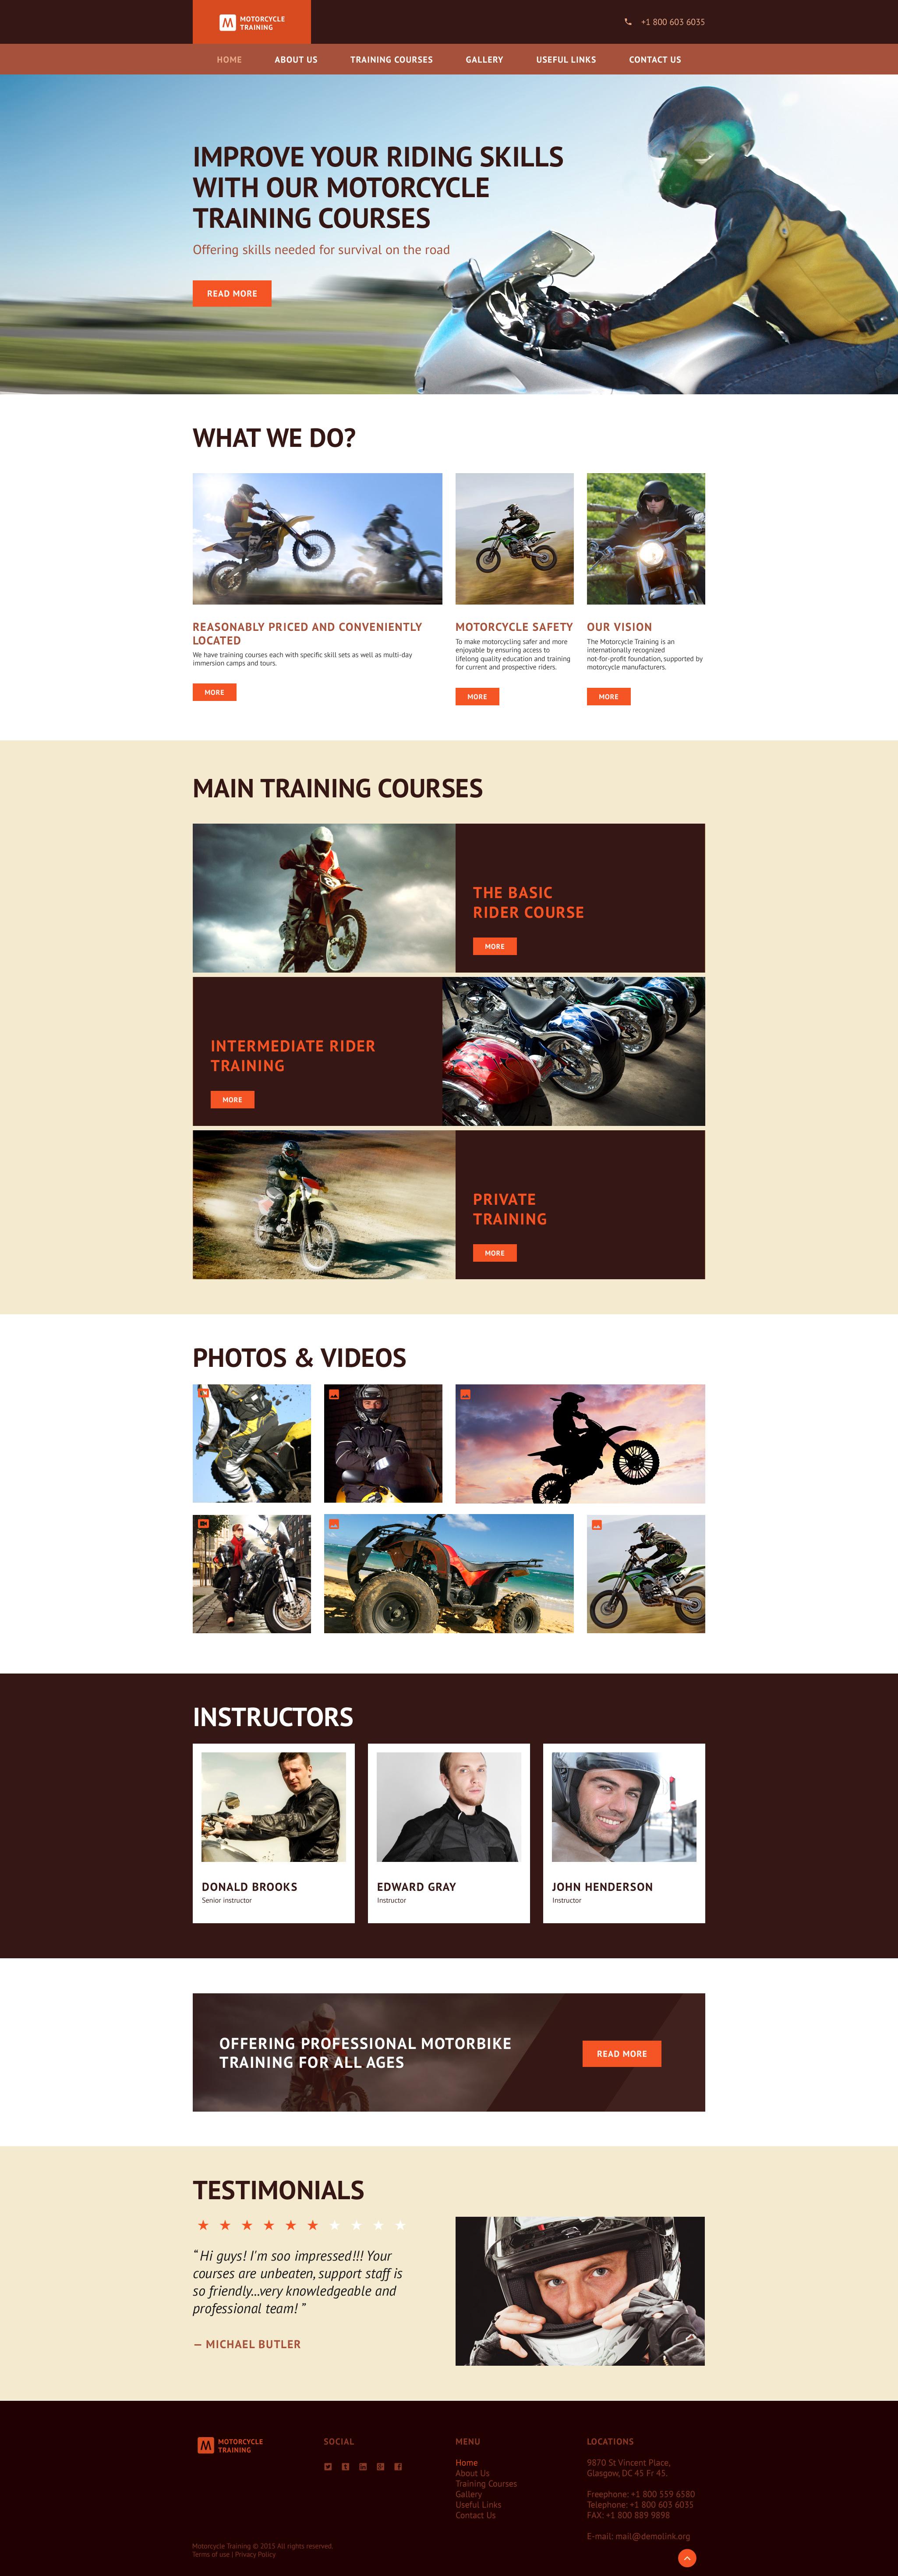 """Motorcycle Training"" modèle web adaptatif #55948 - screenshot"